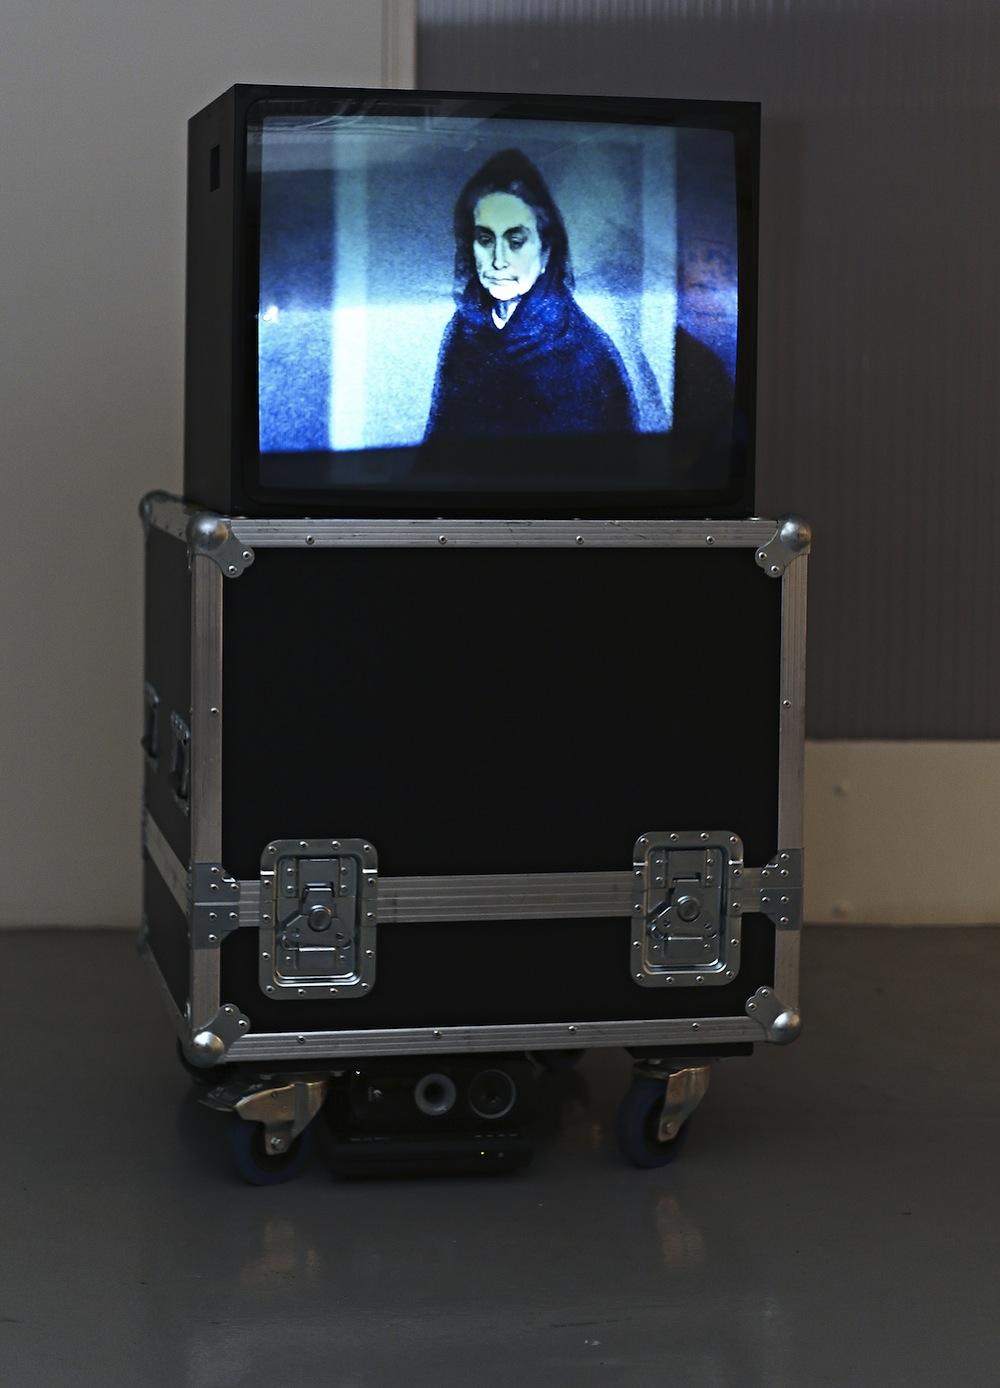 Photo: Darn that Blue, film by Philippa Kuligowski (Glasgow School of Art), 2013